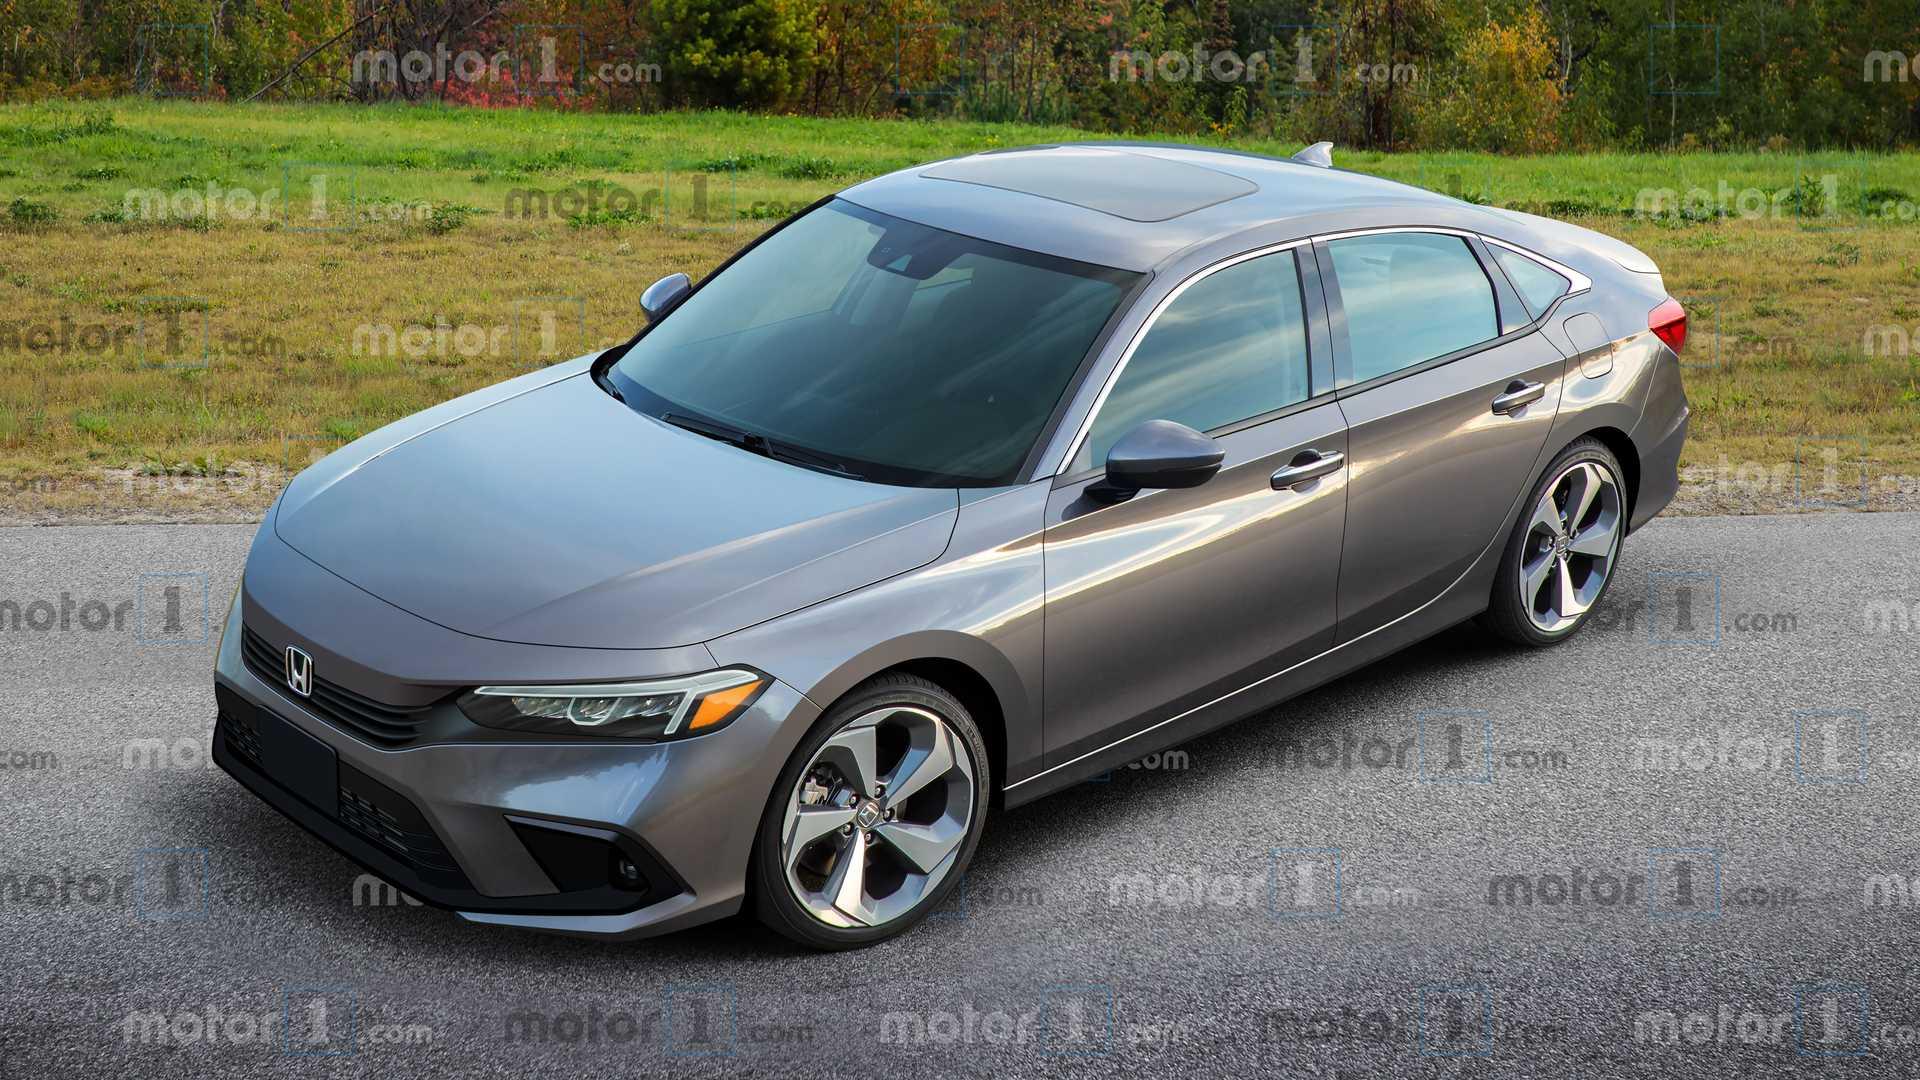 2022 Honda Civic Sedan Rendering